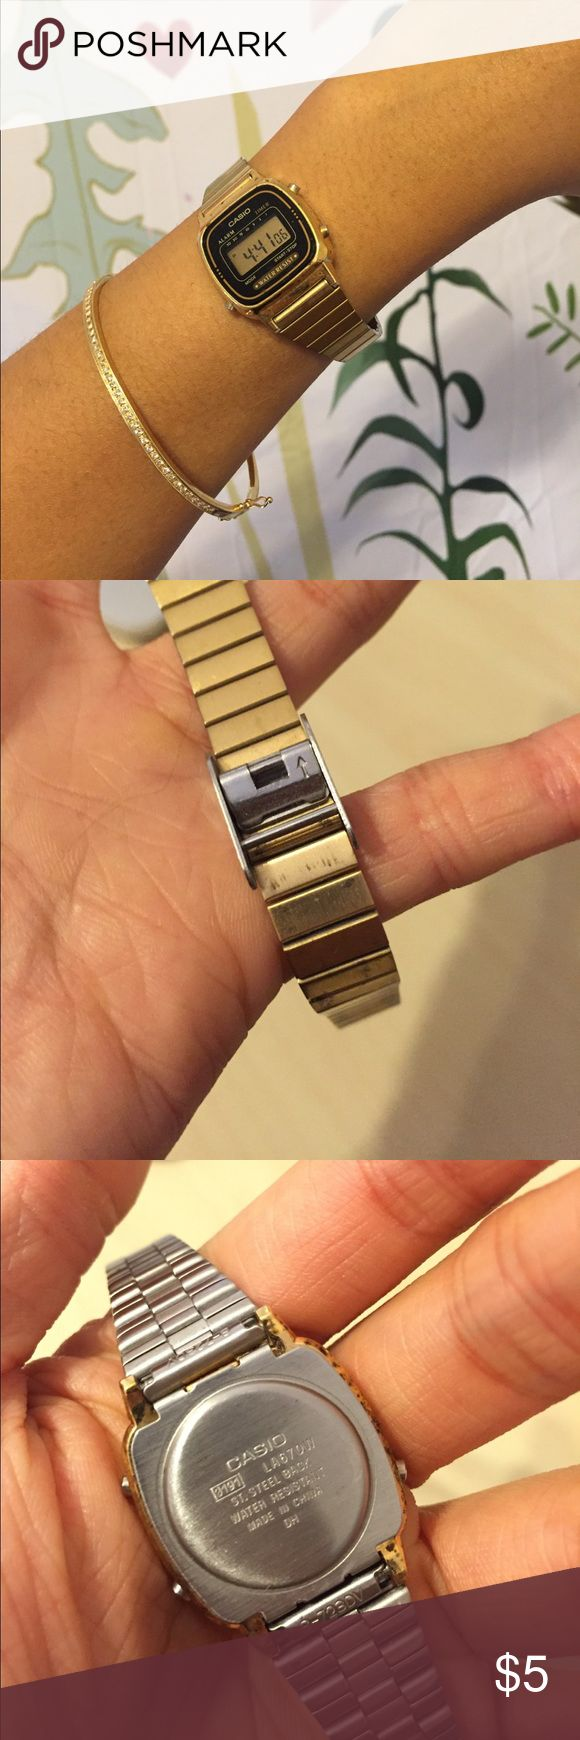 casio gold watch bought three years ago but still working well done casio Casio Accessories Watches